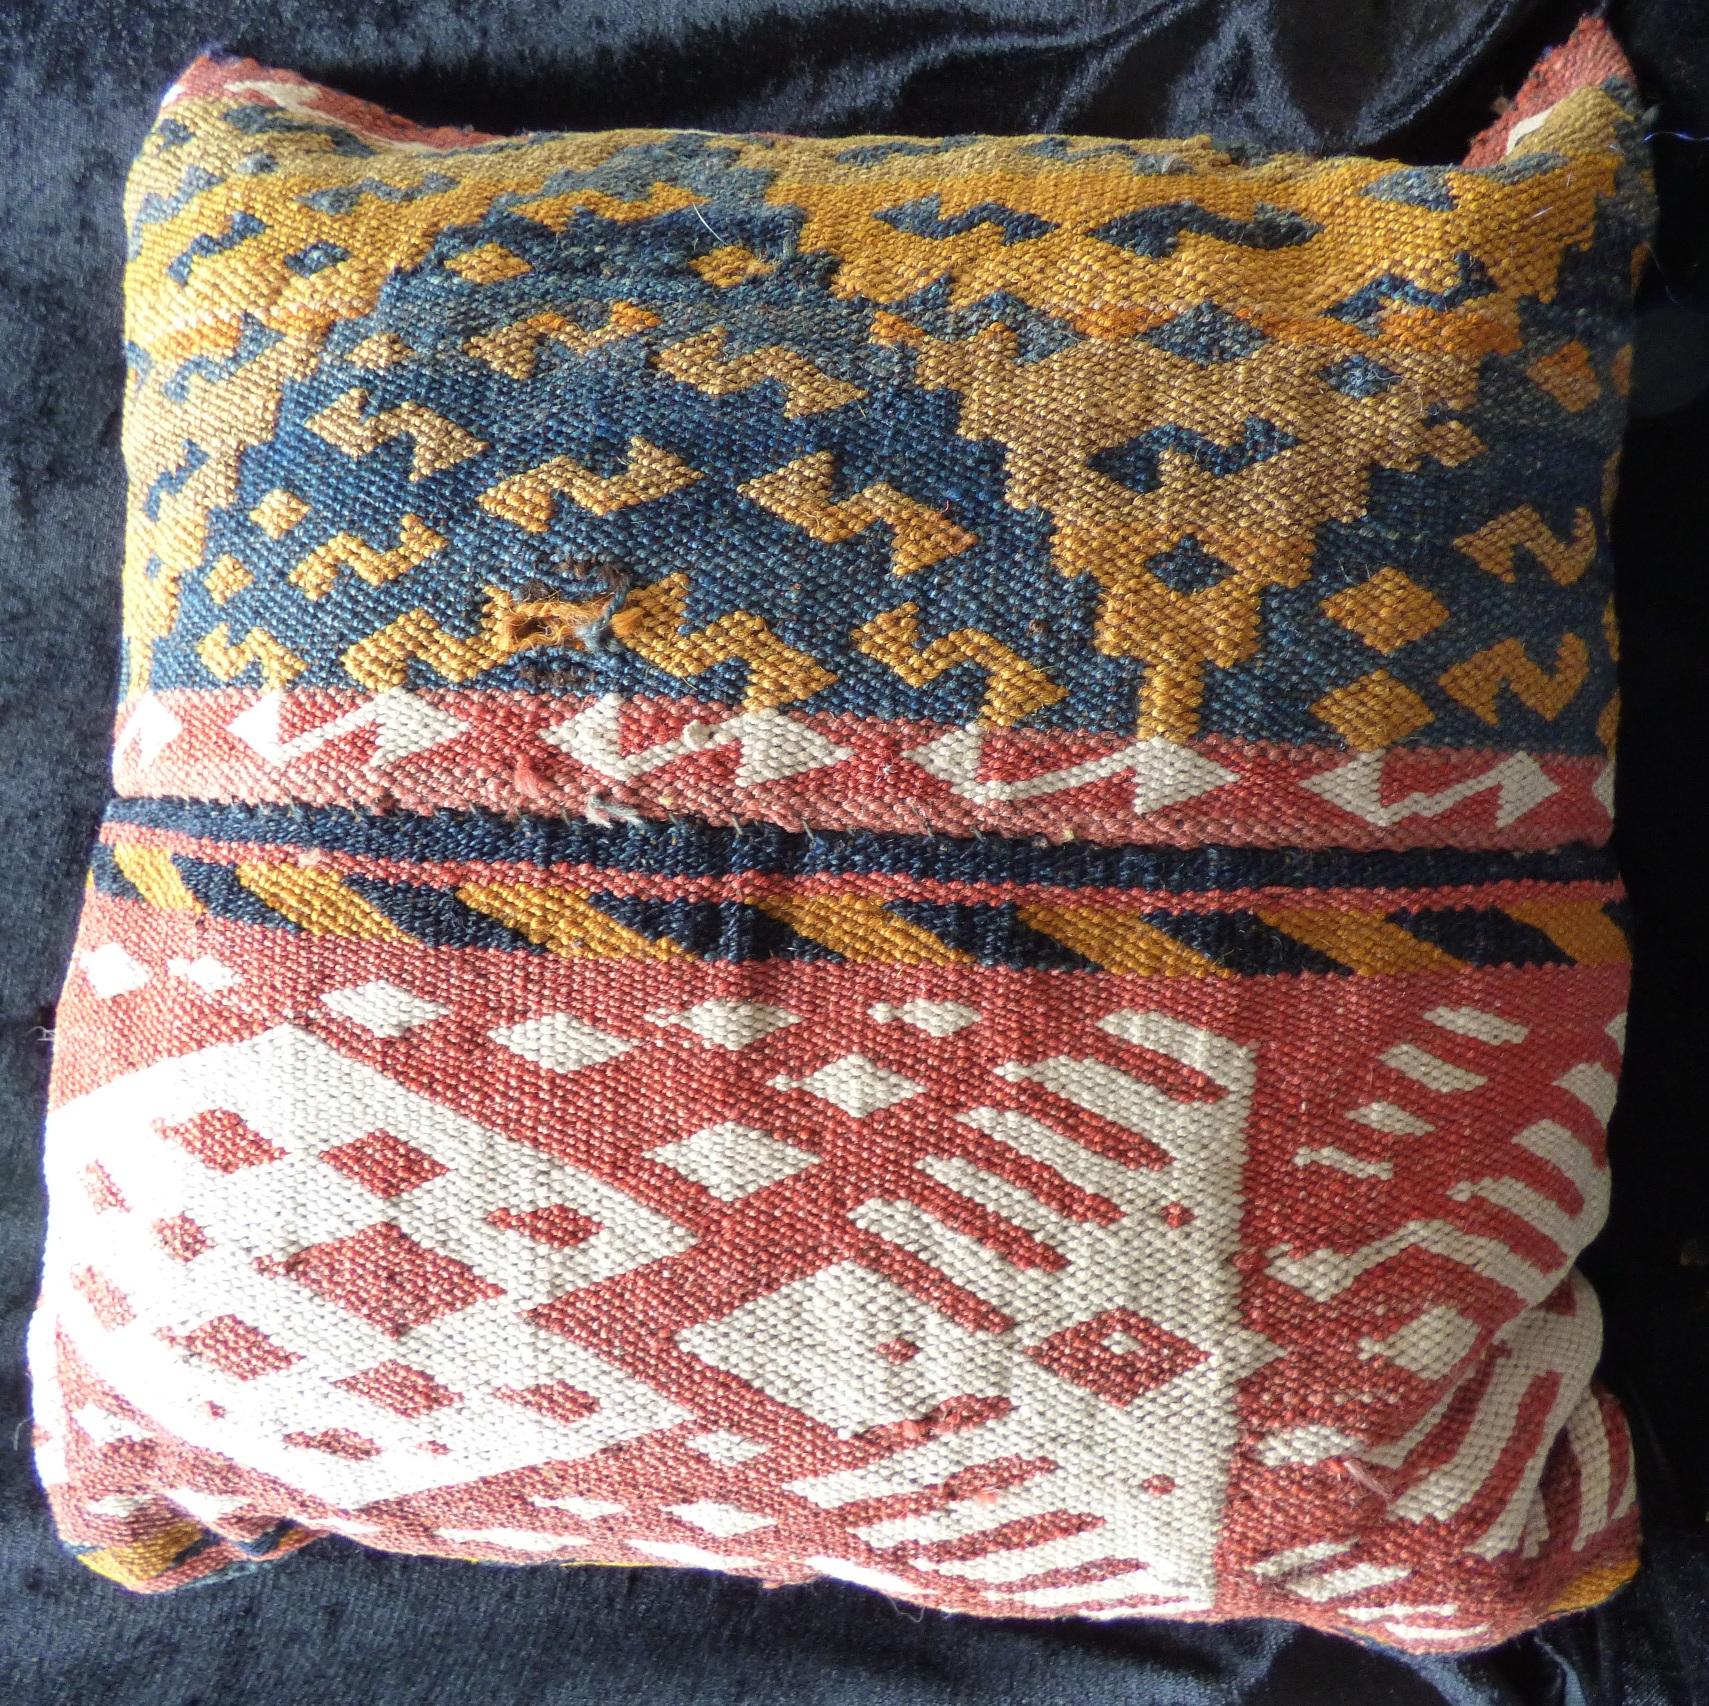 Small Uzbek Kilim Flatweave Gajari Cushion 17066